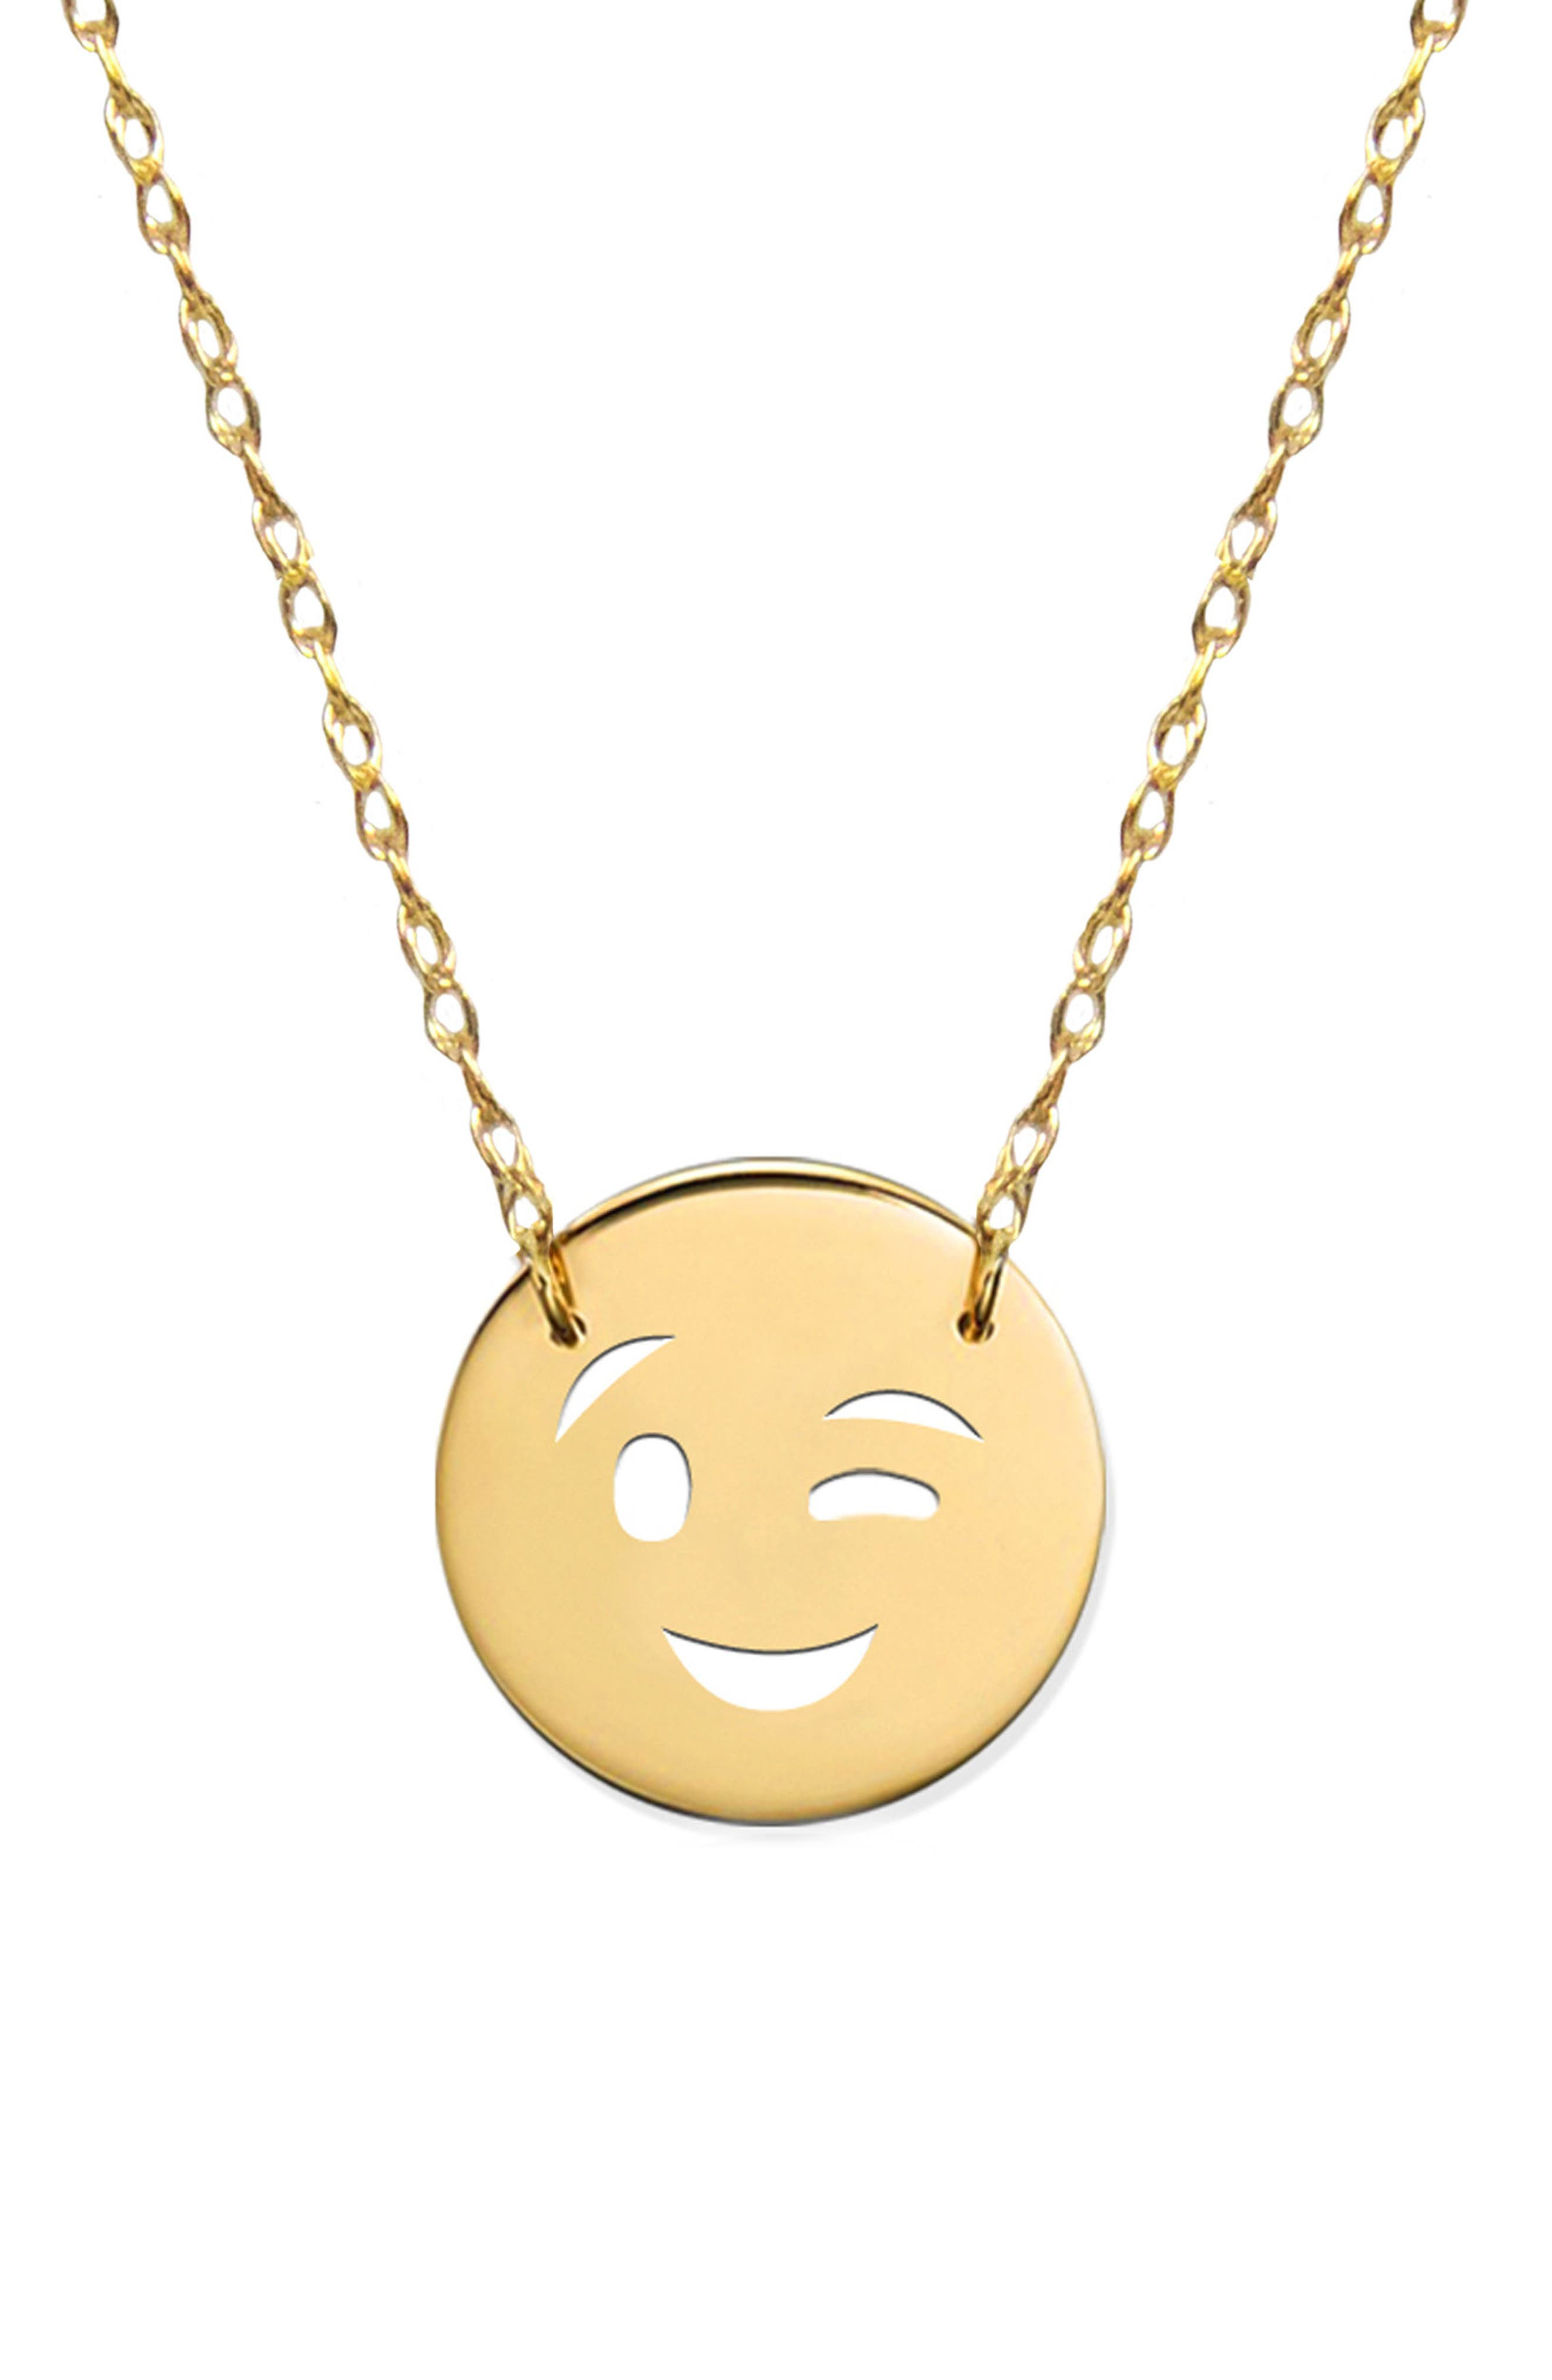 Main Image - Jane Basch Designs Wink Emoji Pendant Necklace (Nordstrom Exclusive)